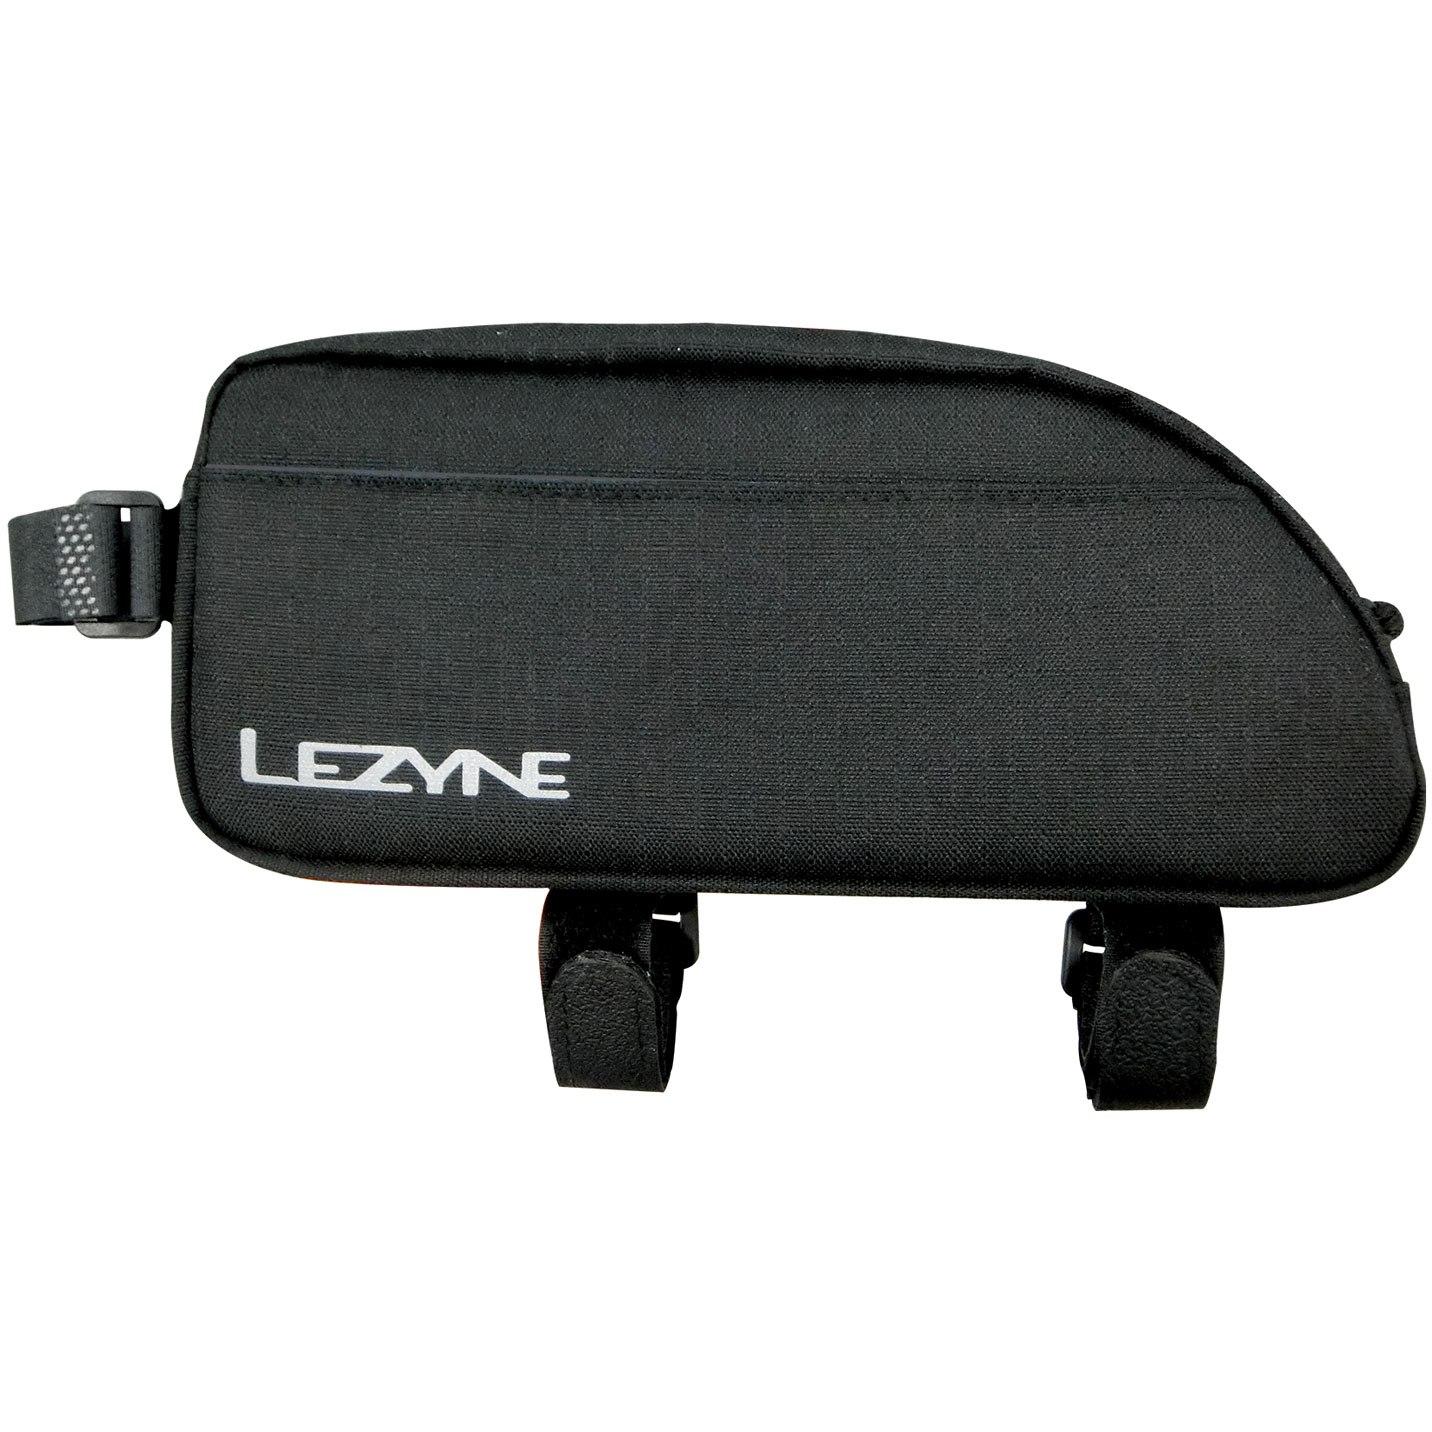 Lezyne Energy Caddy XL Frame Bag - black